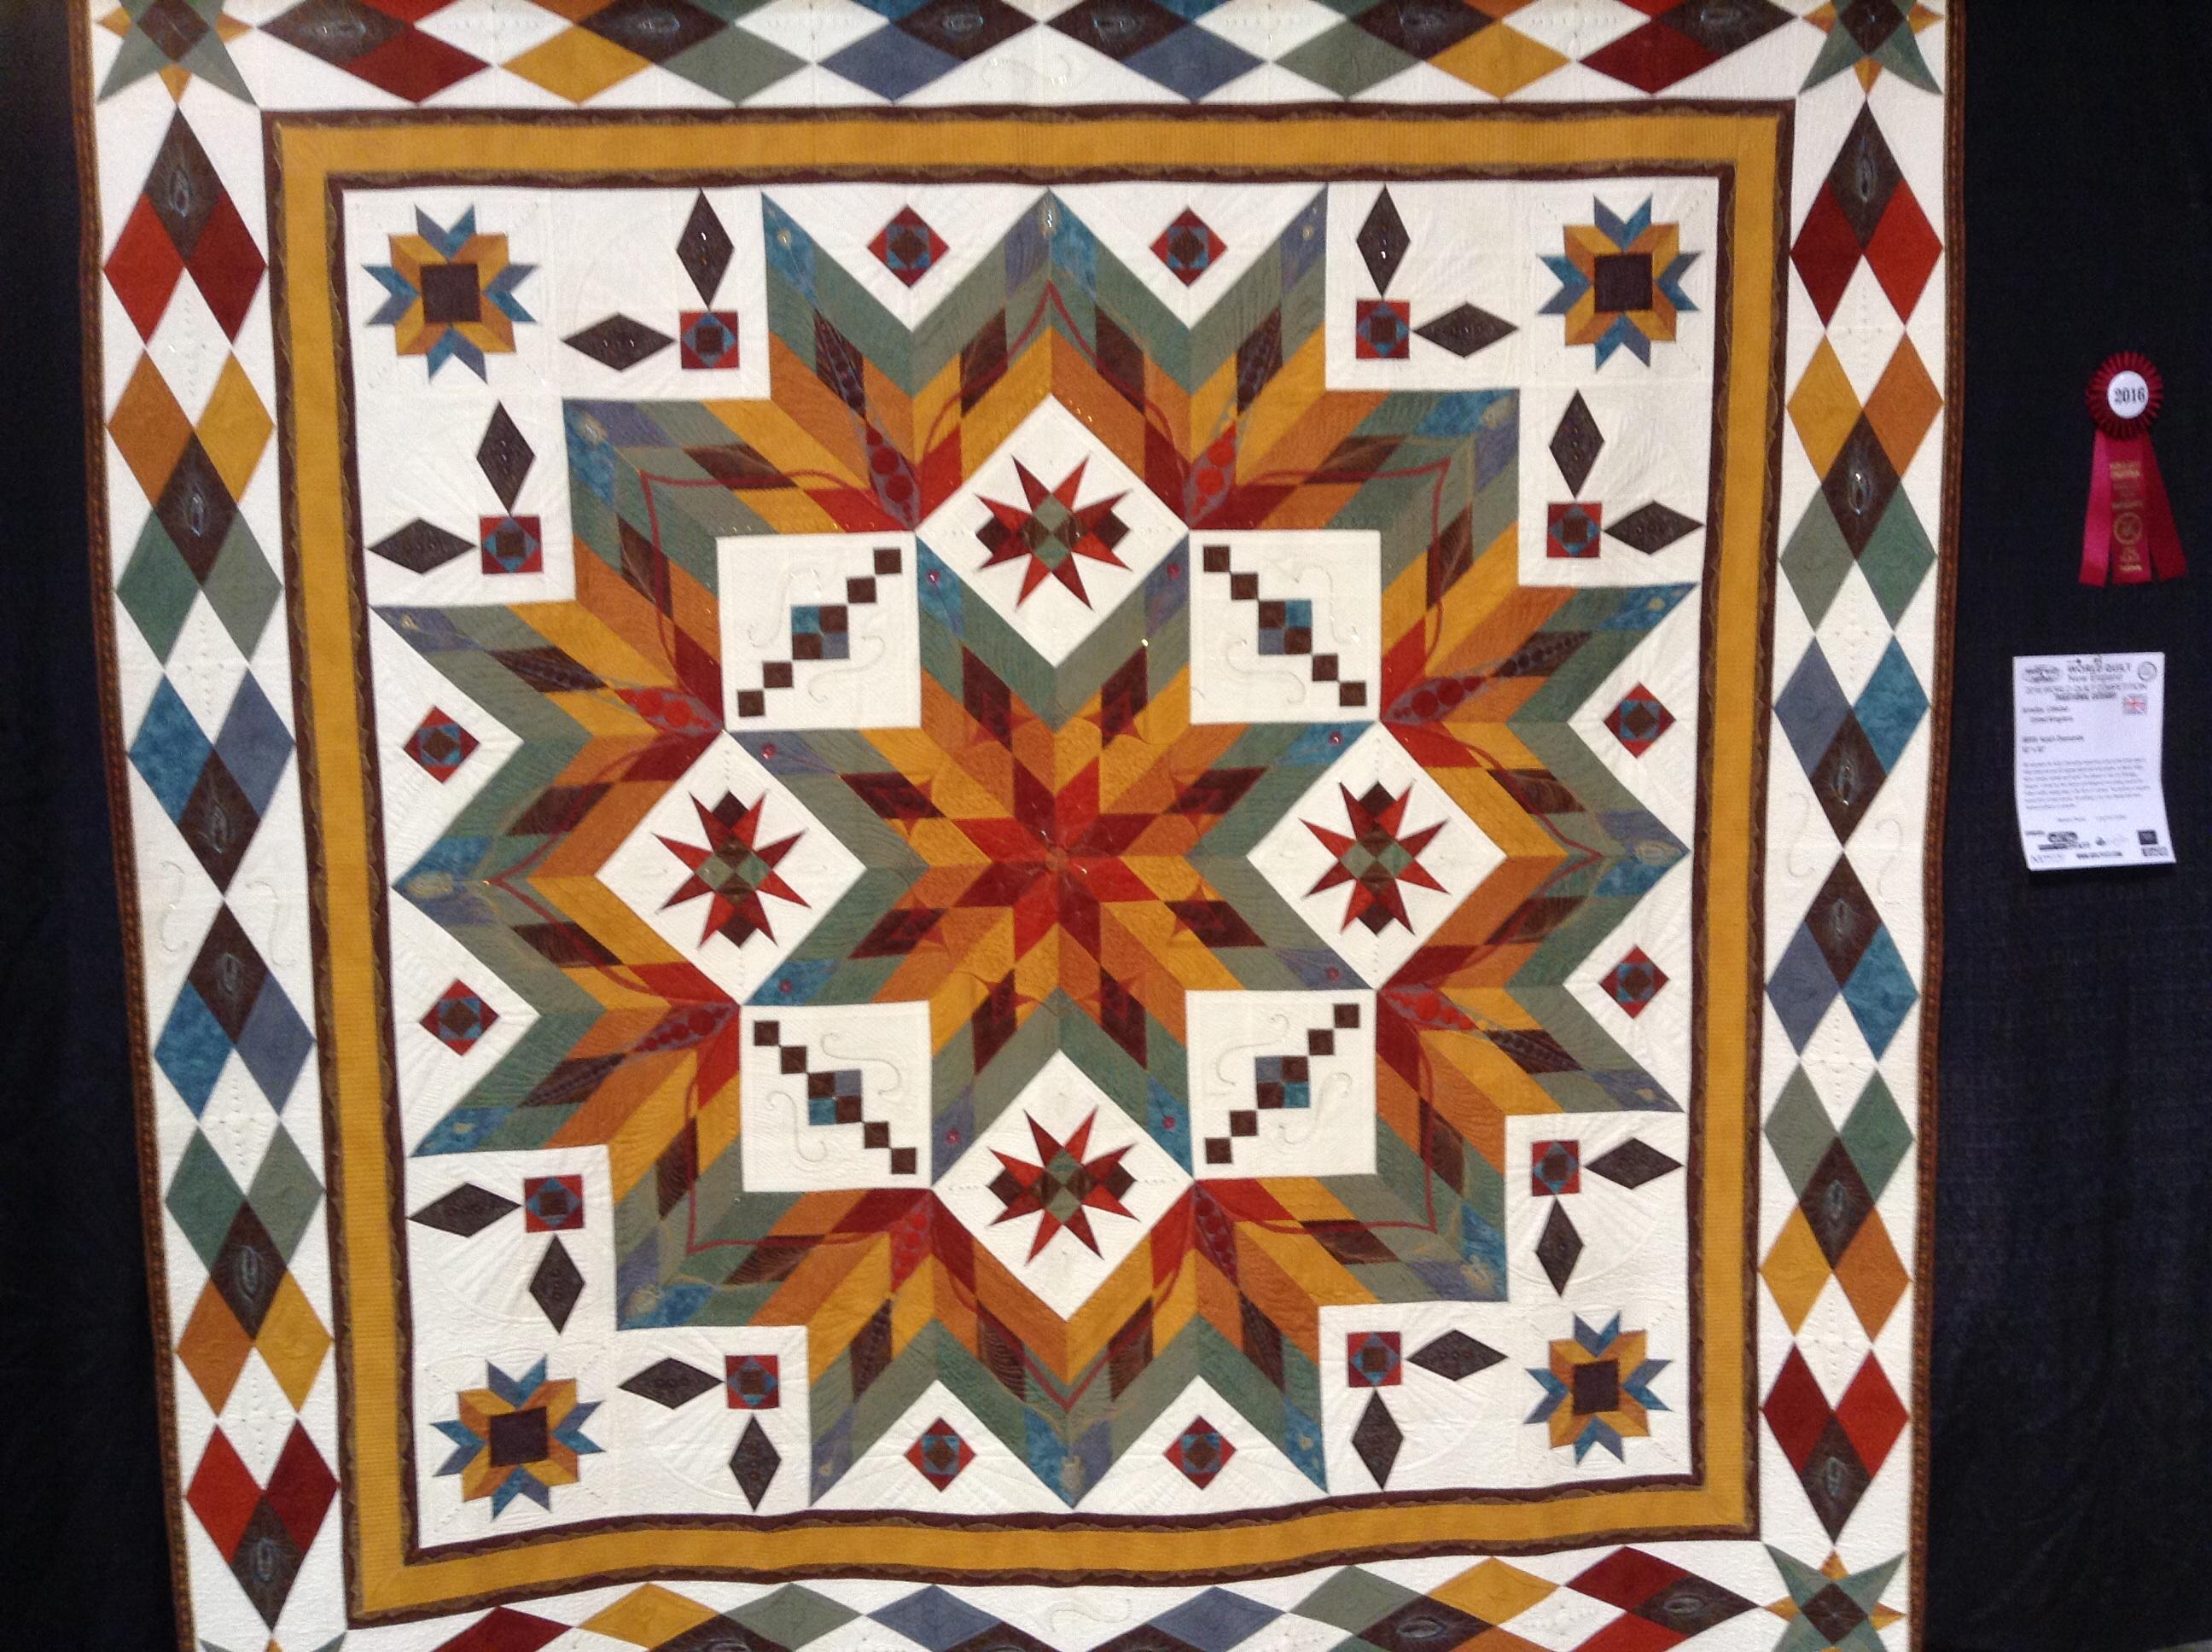 Quilting Board - Uncategorized - Blogs : quilt show manchester nh - Adamdwight.com